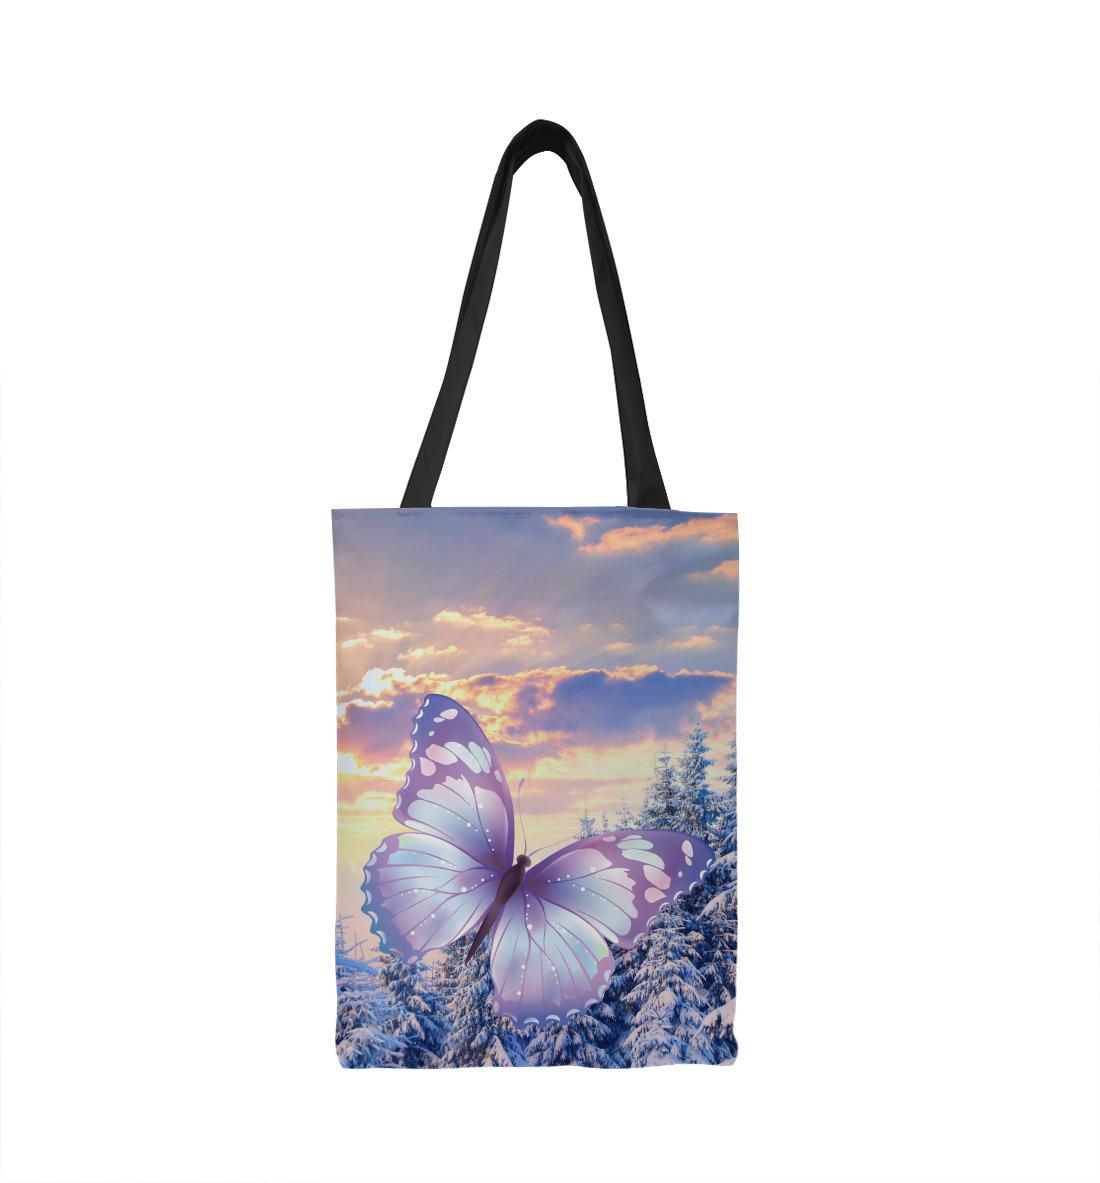 Фото - Зимняя бабочка зимняя стужа